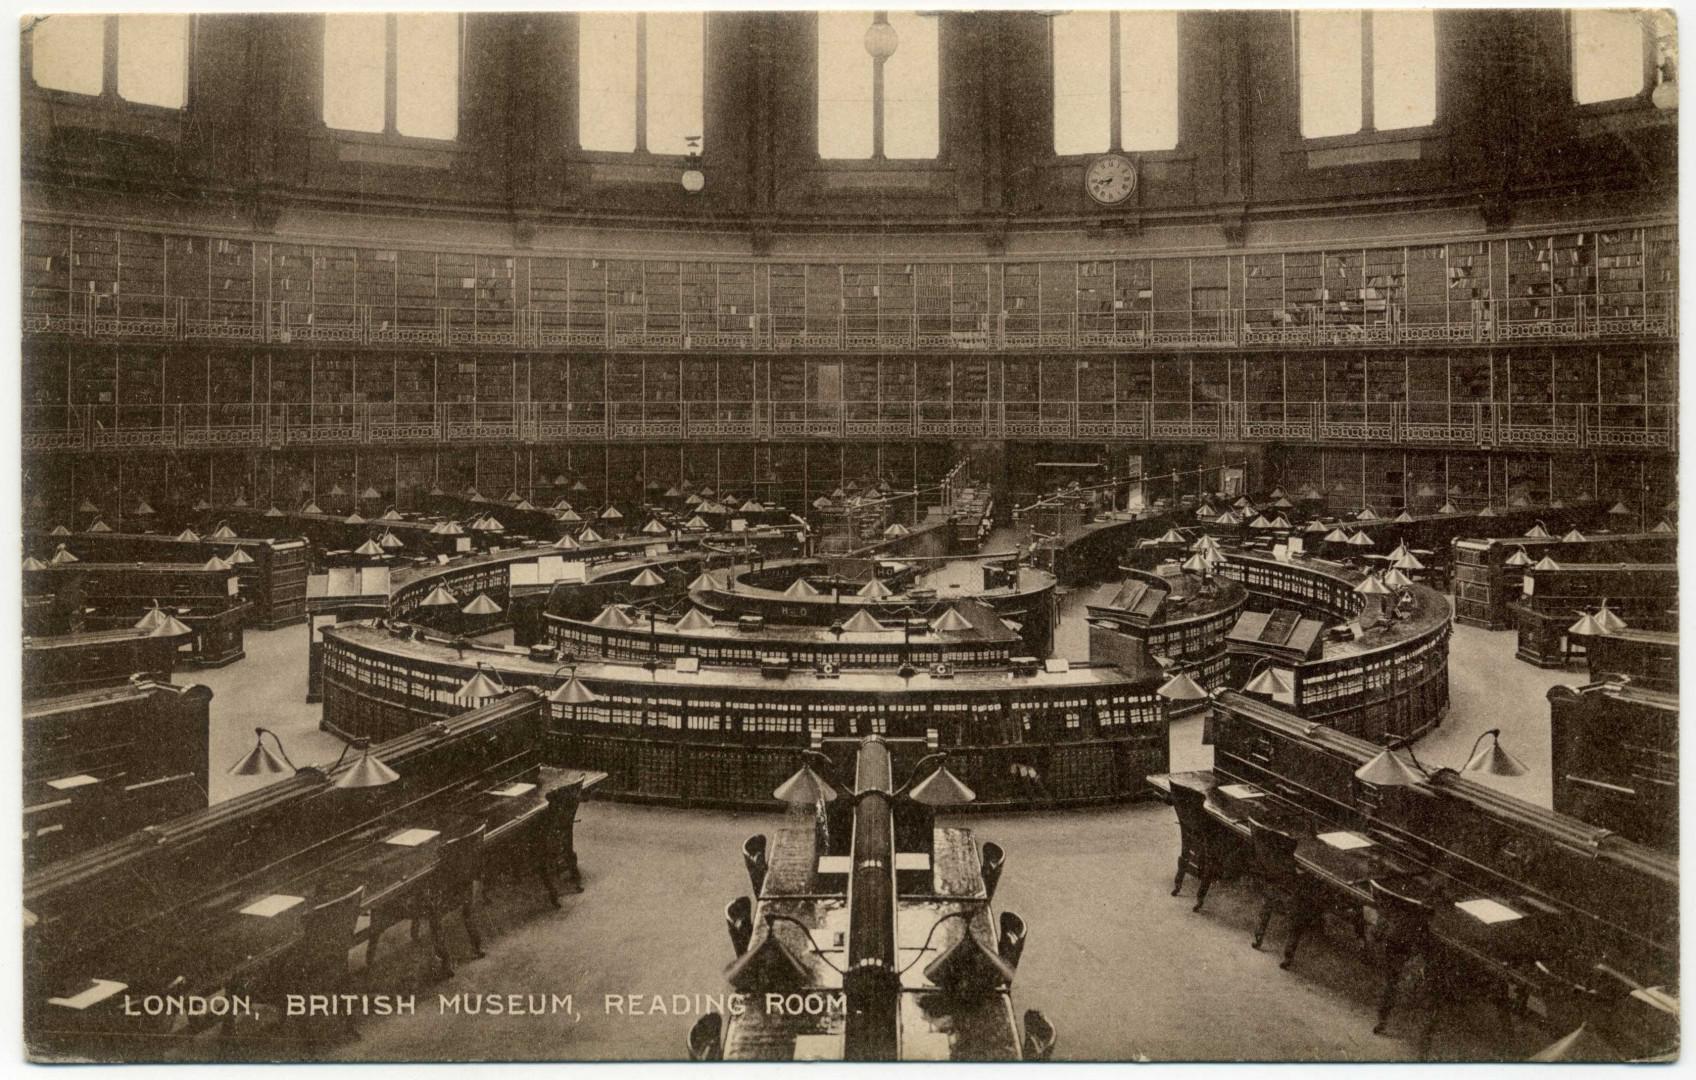 London: British Museum Reading Room